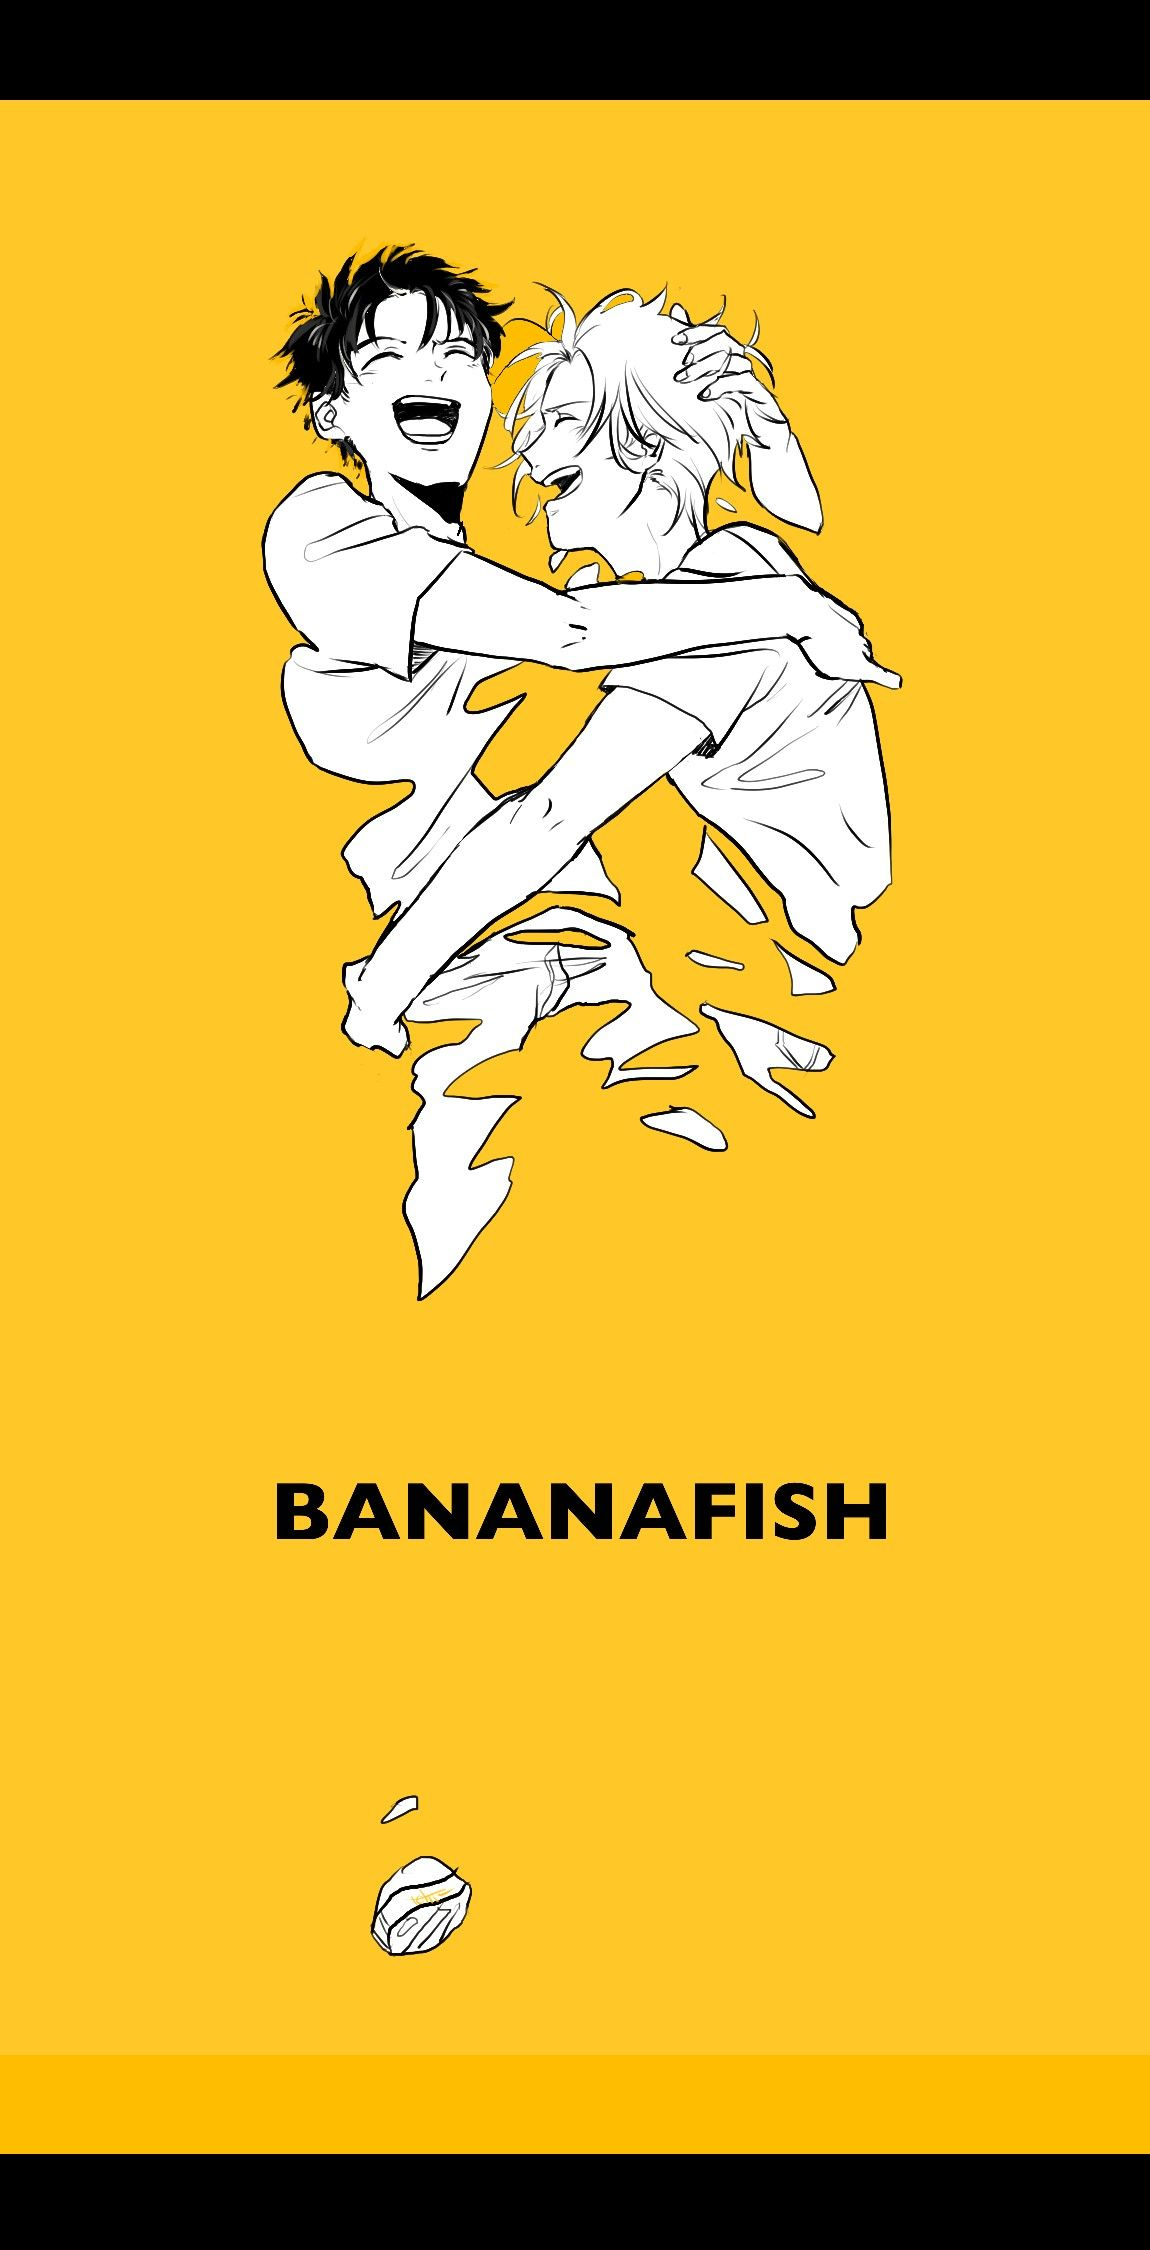 Wallpaper | Anime wallpaper, Fish wallpaper, Fish